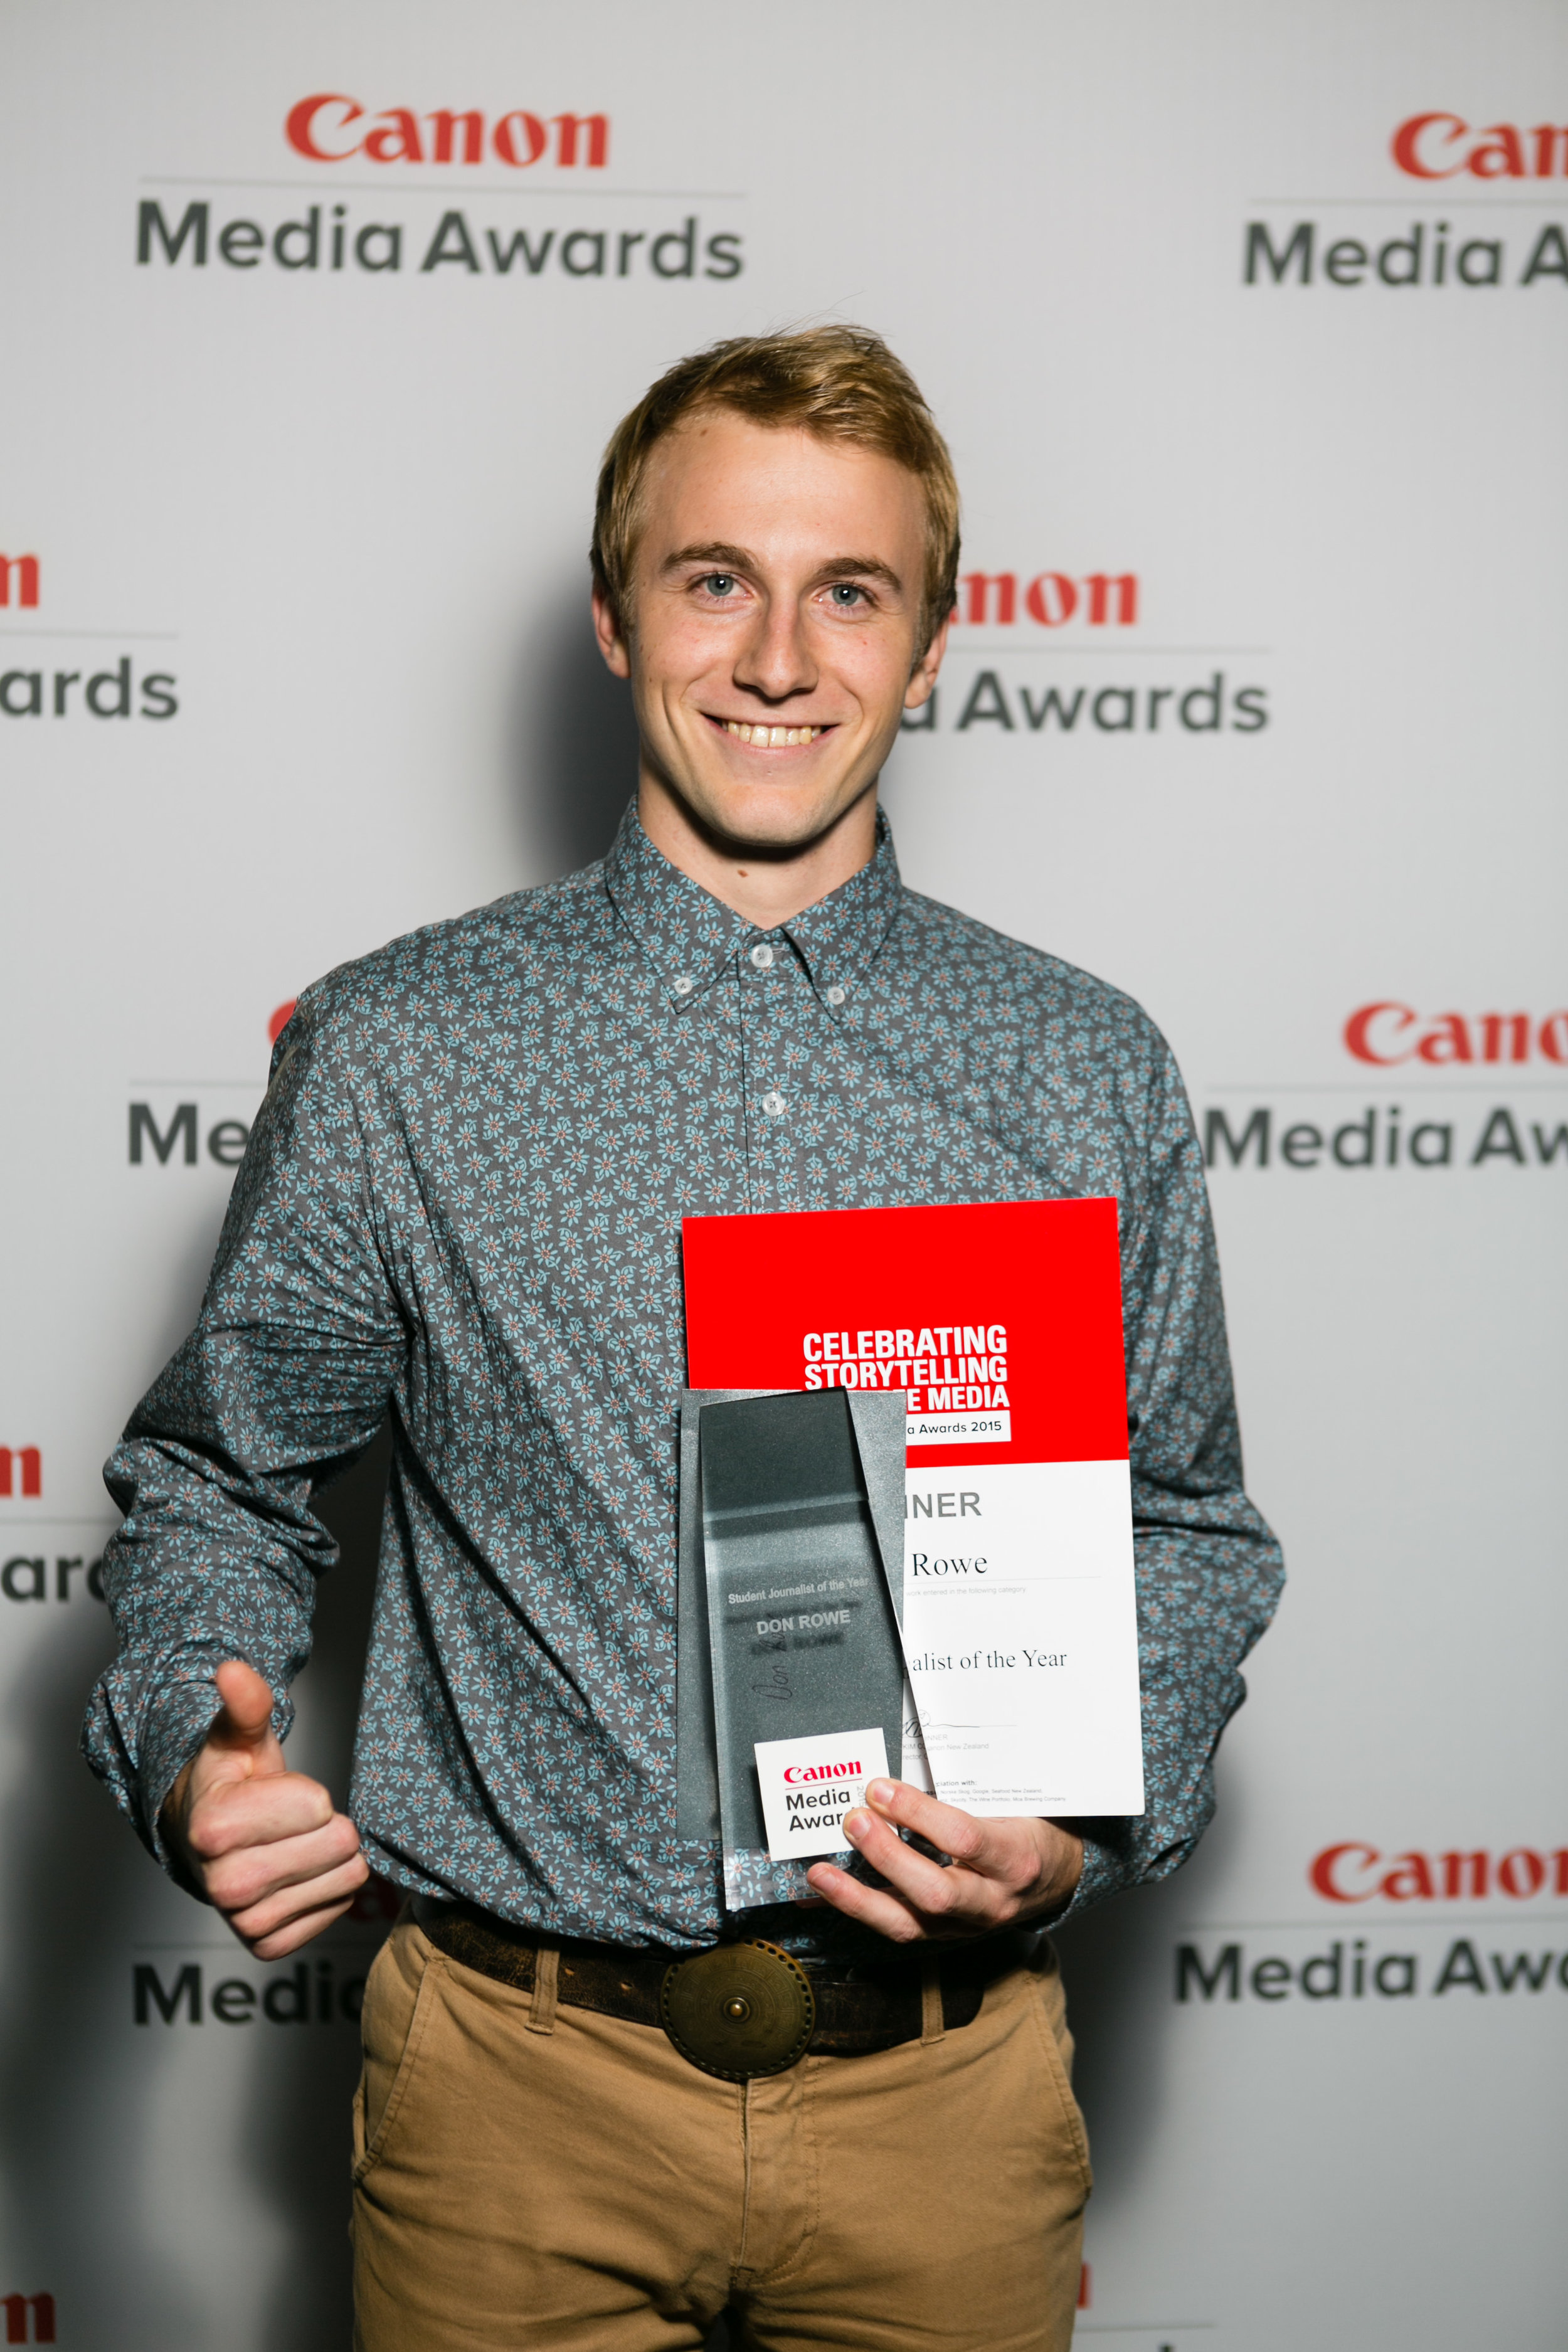 canon_media_awards_2015_interlike_nz_clinton_tudor-5919-185.jpg